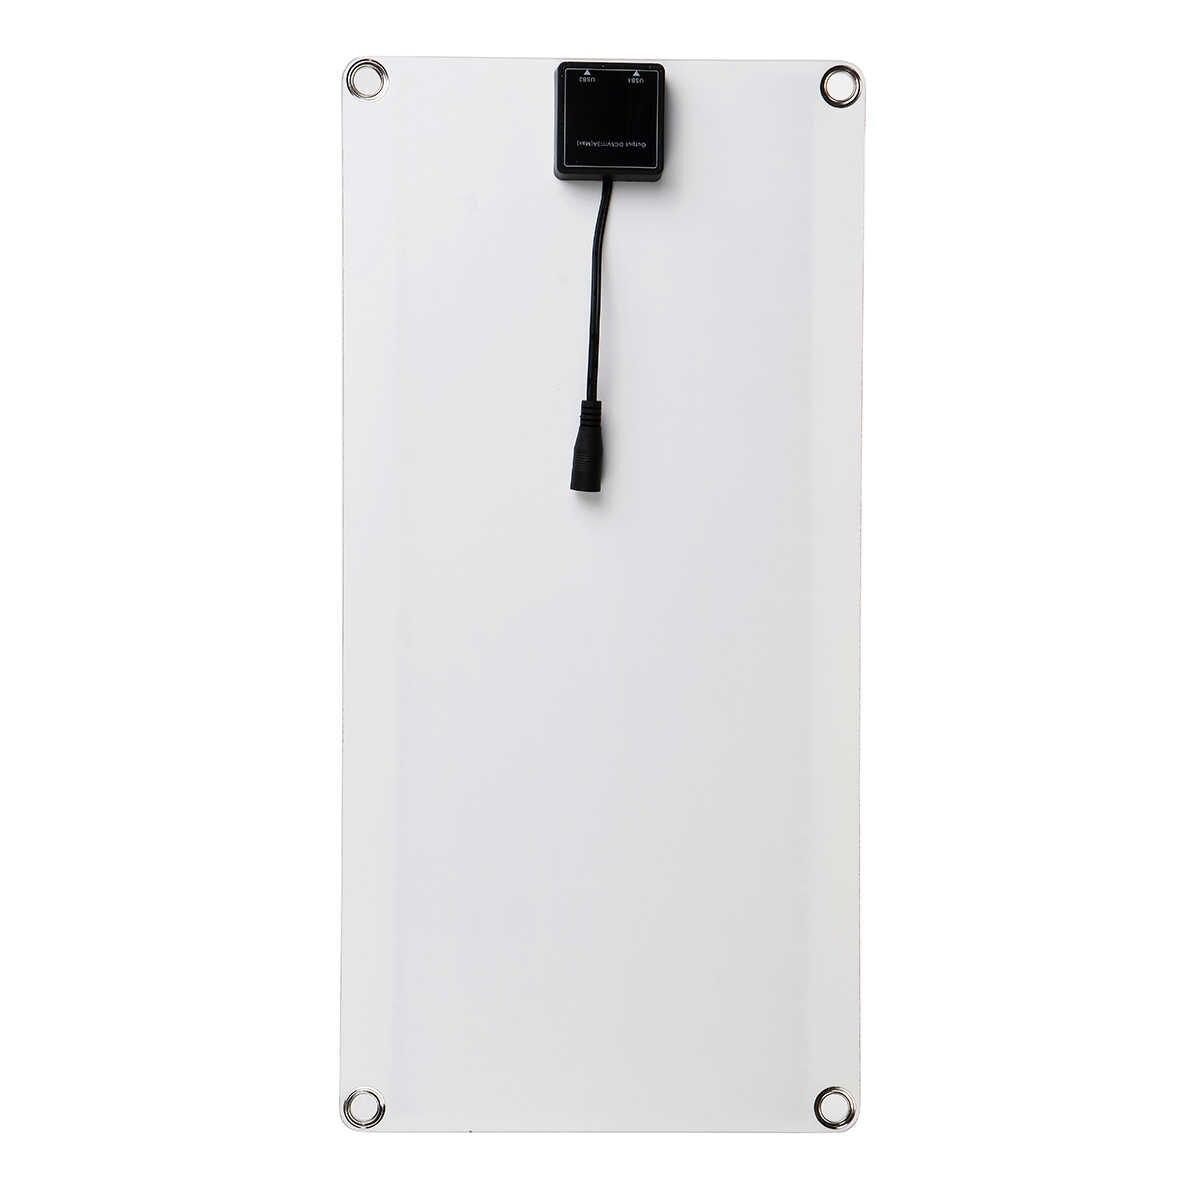 30W 18V ألواح الطاقة الشمسية المحمولة مزدوج USB قوة البنك مجلس بطارية خارجية شحن الخلايا الشمسية مجلس كروكودايل شاحن سيارة